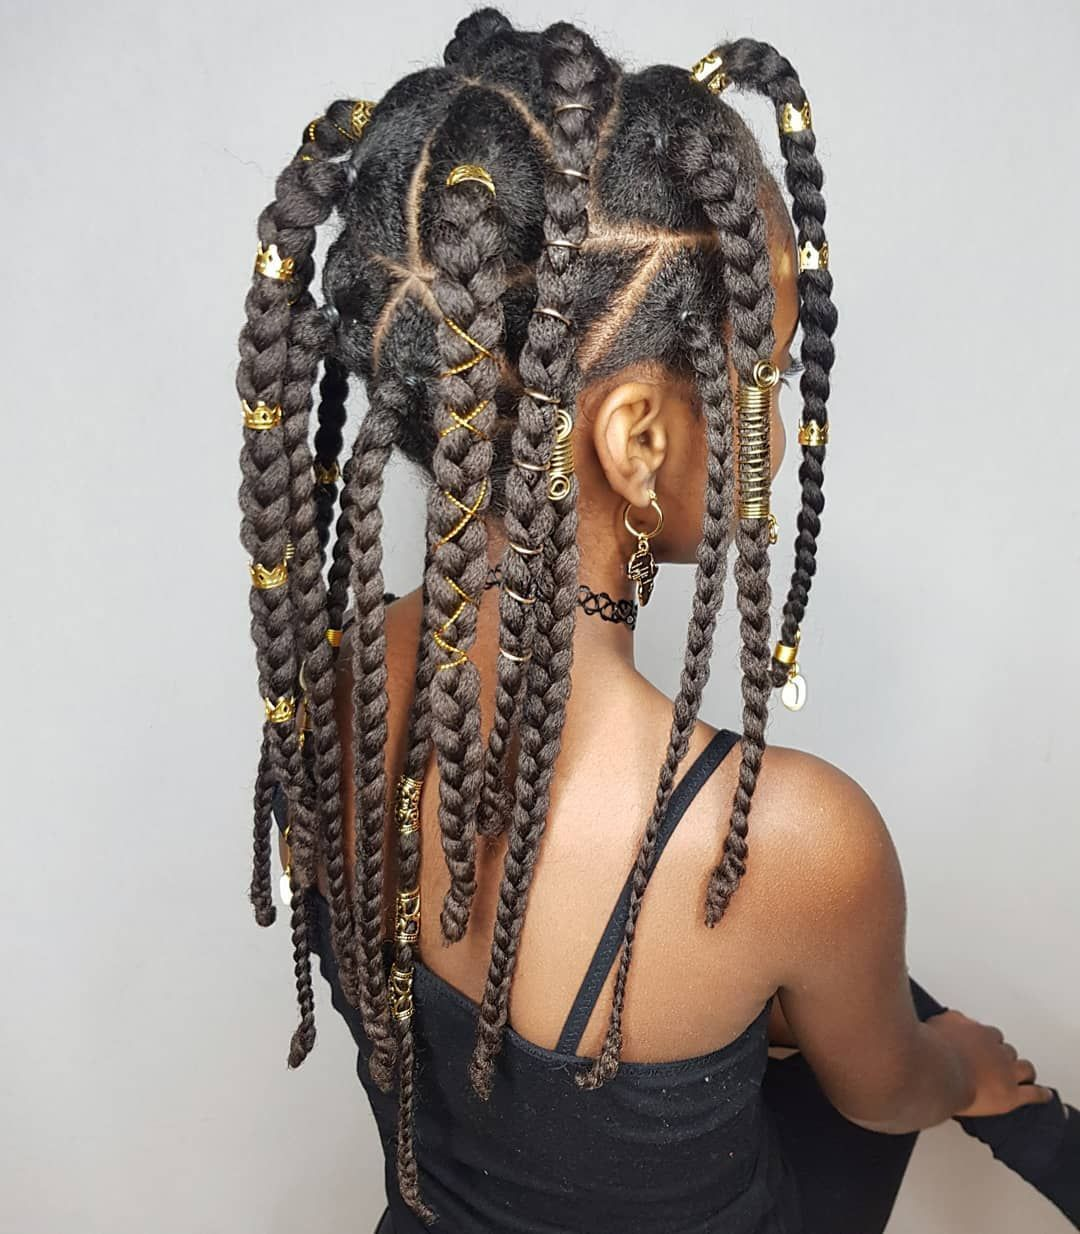 Shanilliaus latest hairstyle simple yet soooo cute